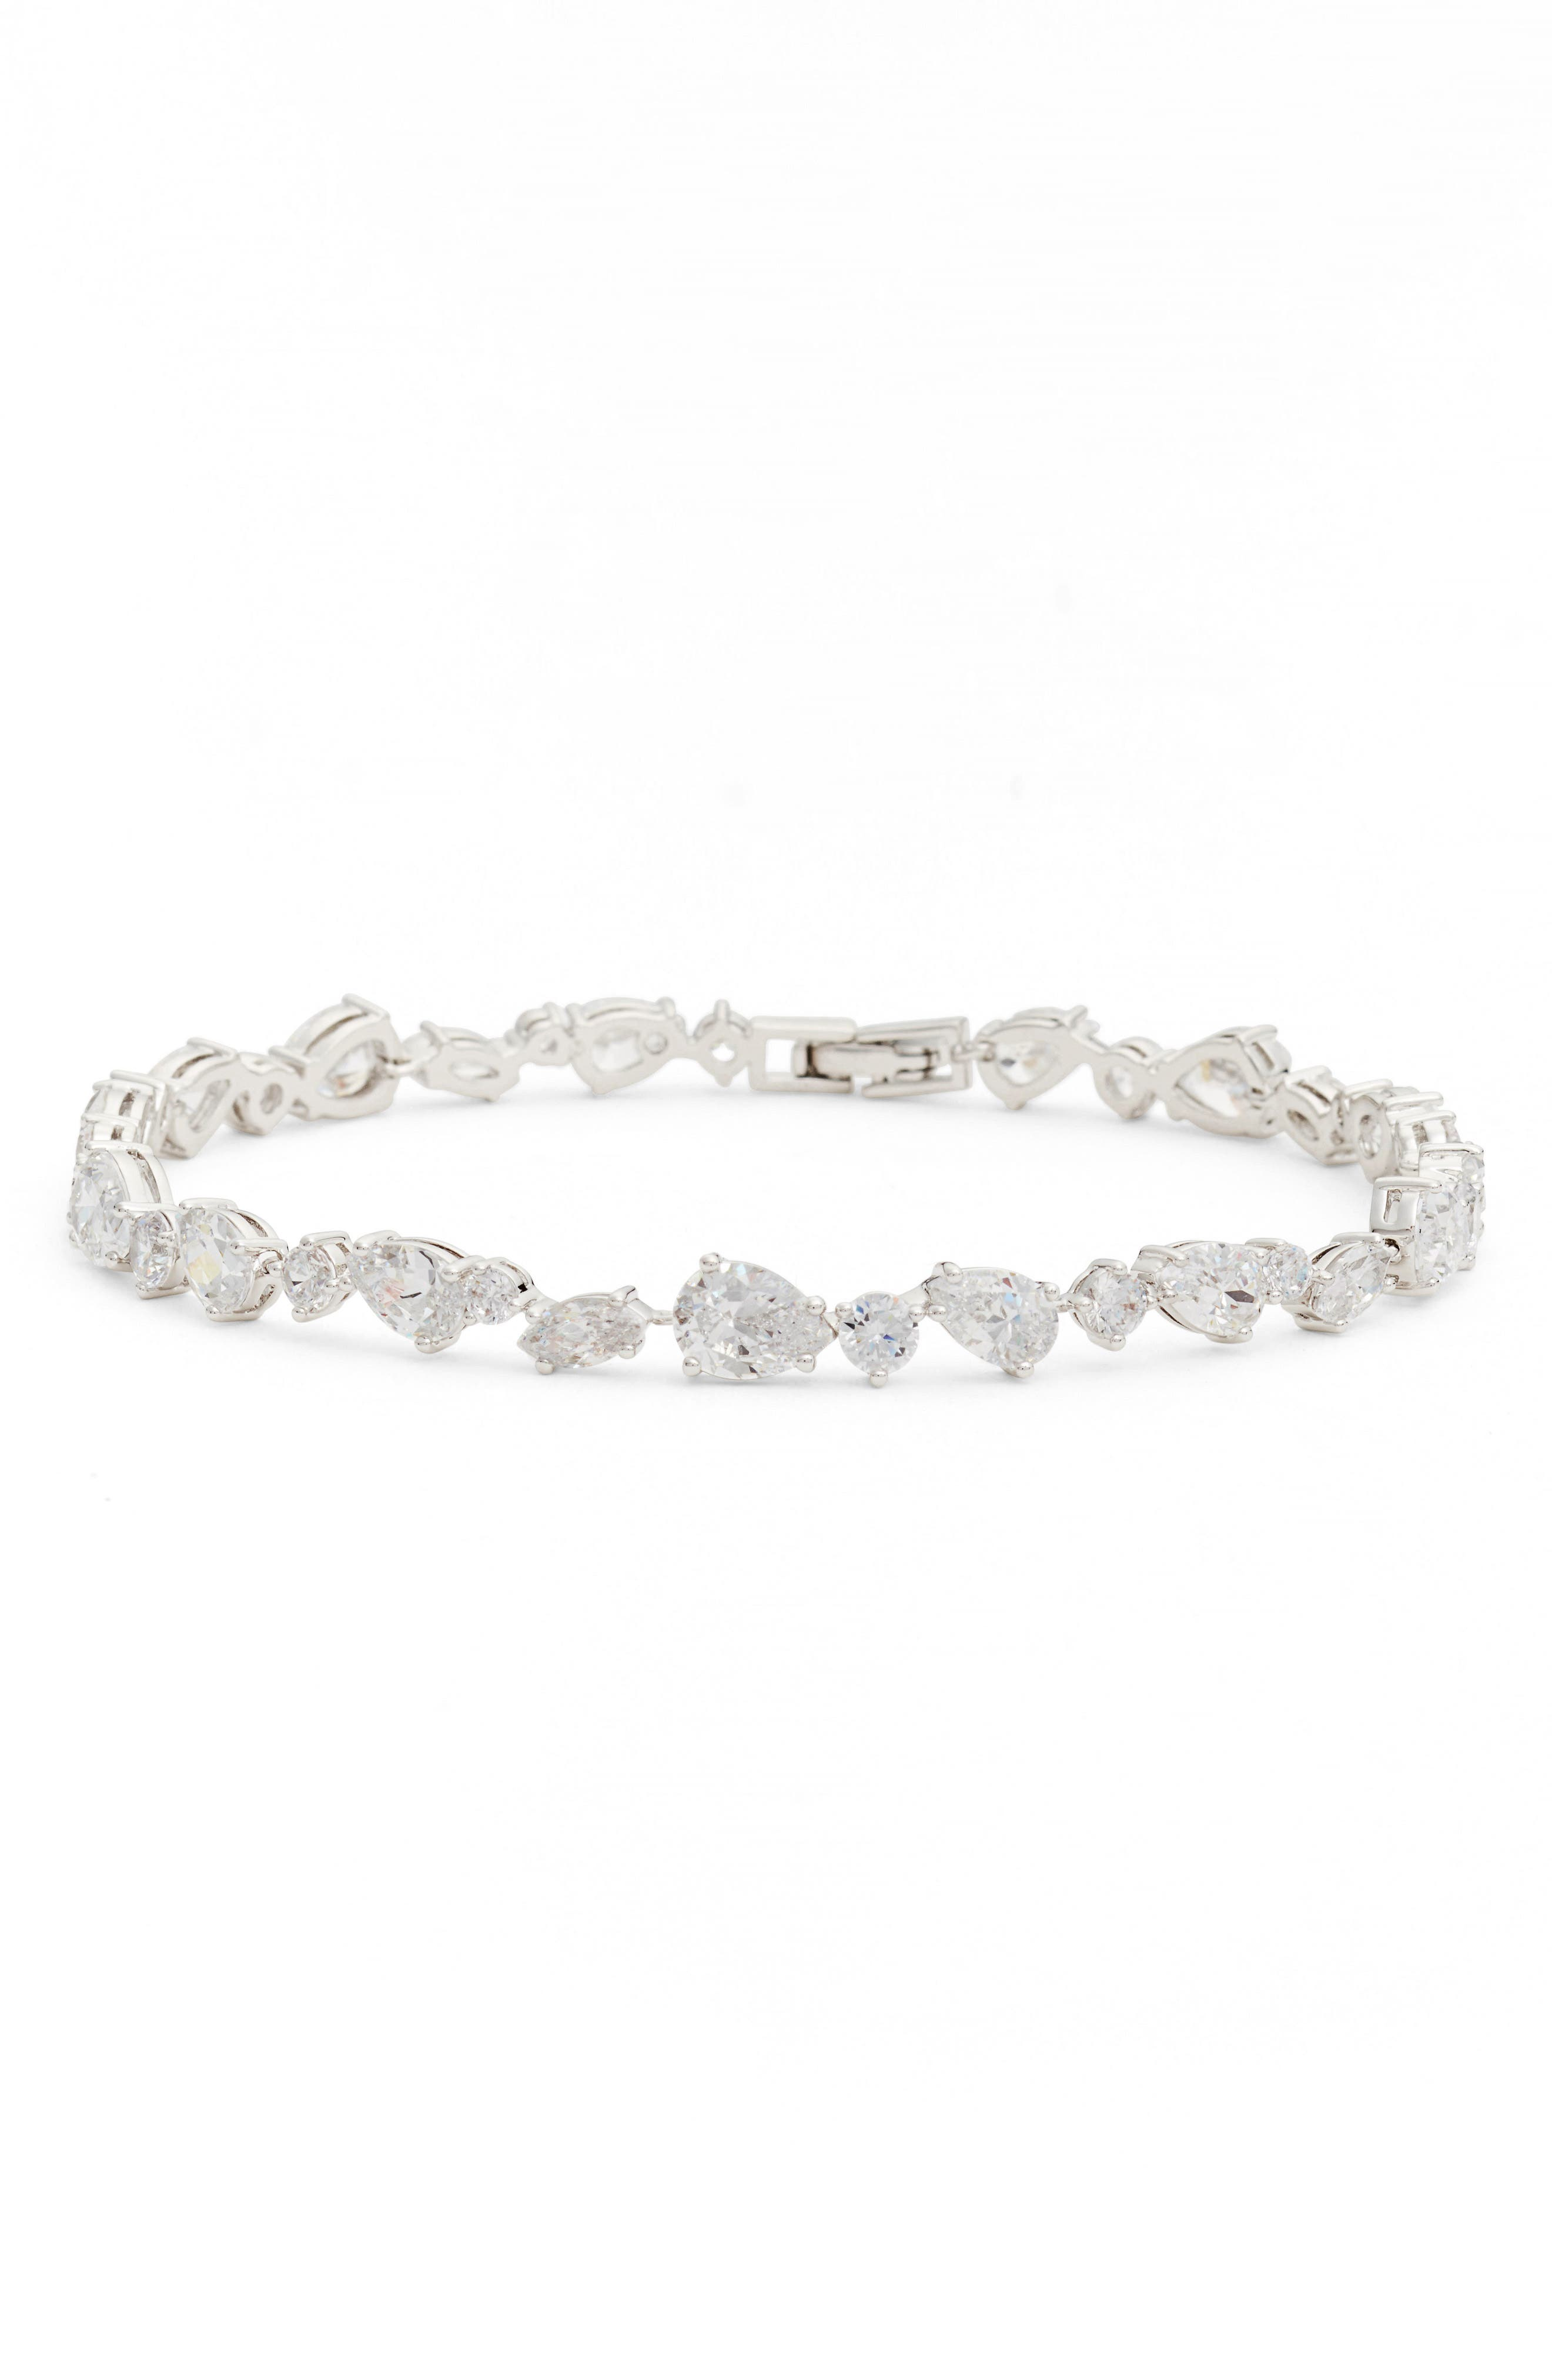 Ava Line Bracelet,                         Main,                         color, Silver